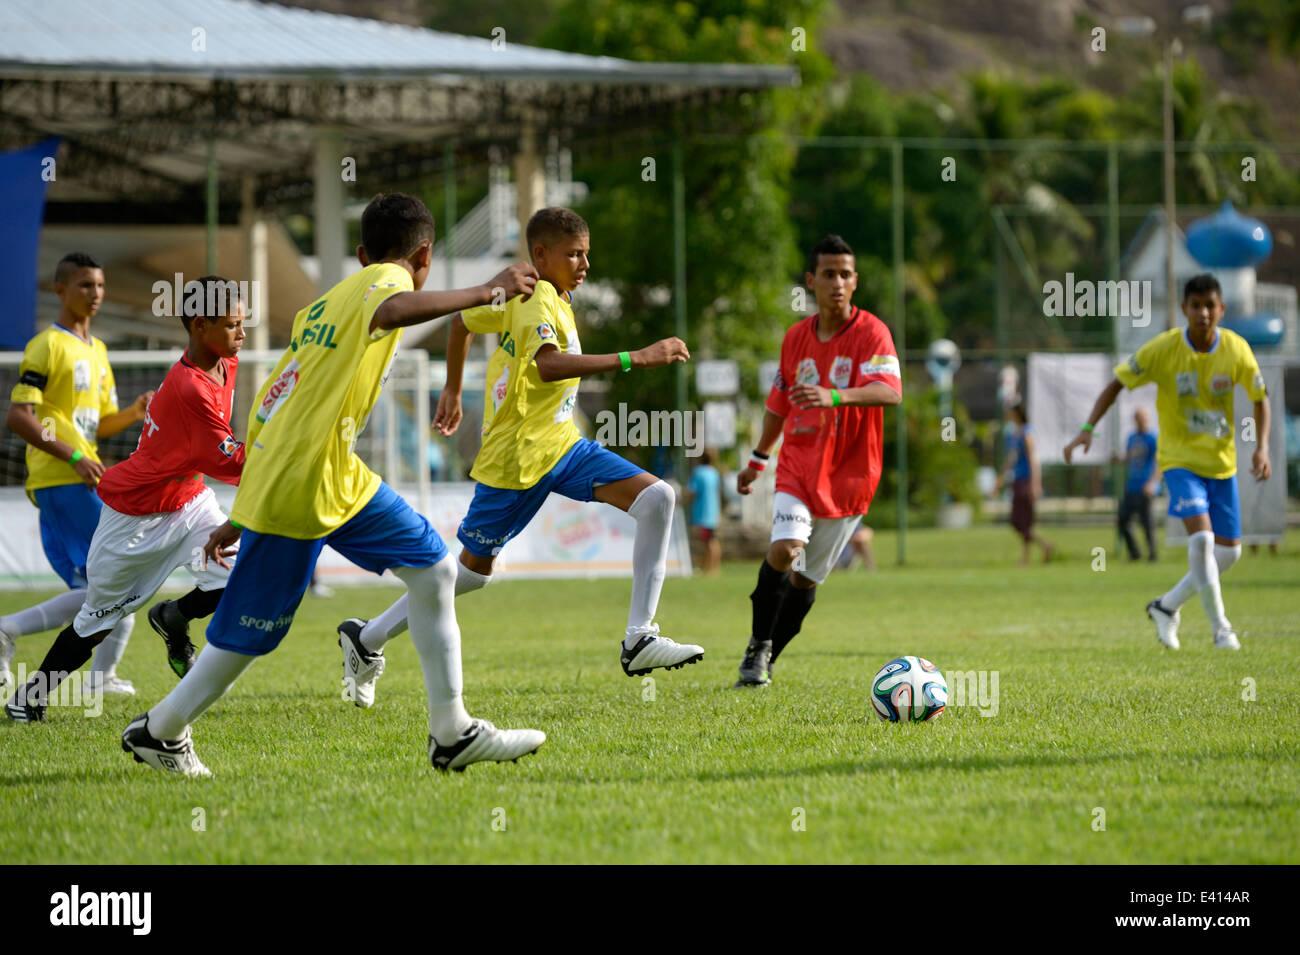 Brazil, Rio de Janeiro, Street Child World Cup 2014 football team of Egypt playing against football team of Brazil - Stock Image